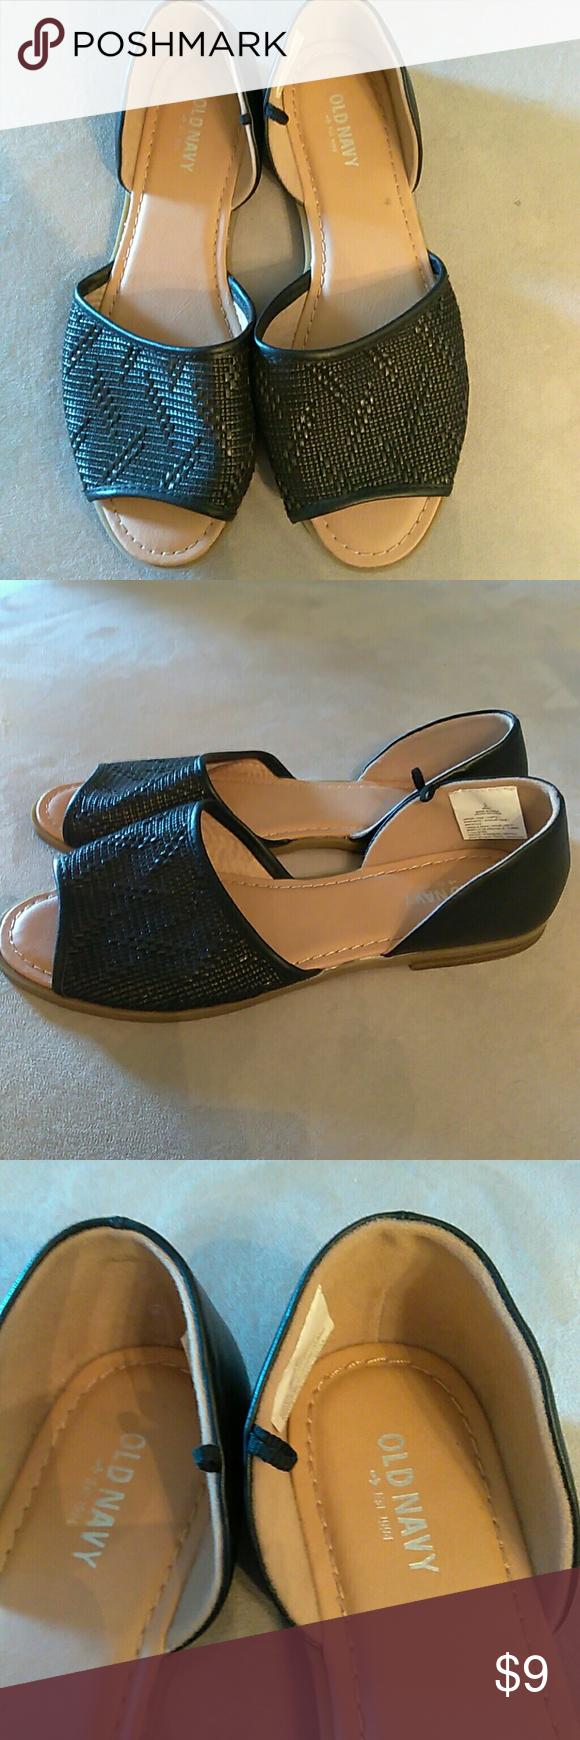 Black sandals old navy - Old Navy Black And Tan Sandals Old Navy Black And Tan Sandals Gently Used